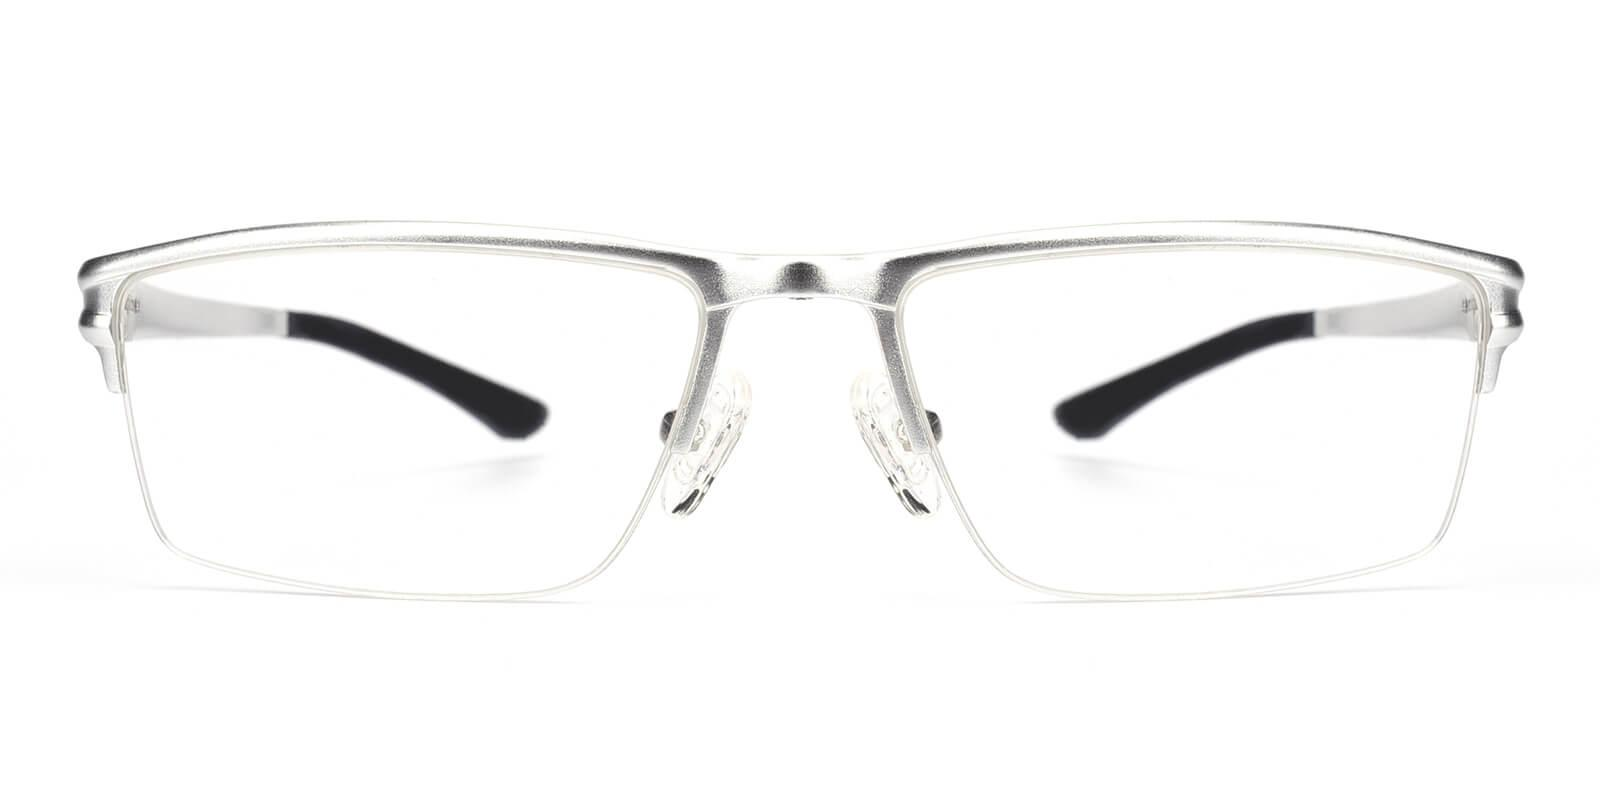 Leonado-Silver-Rectangle-Metal-Eyeglasses-additional2